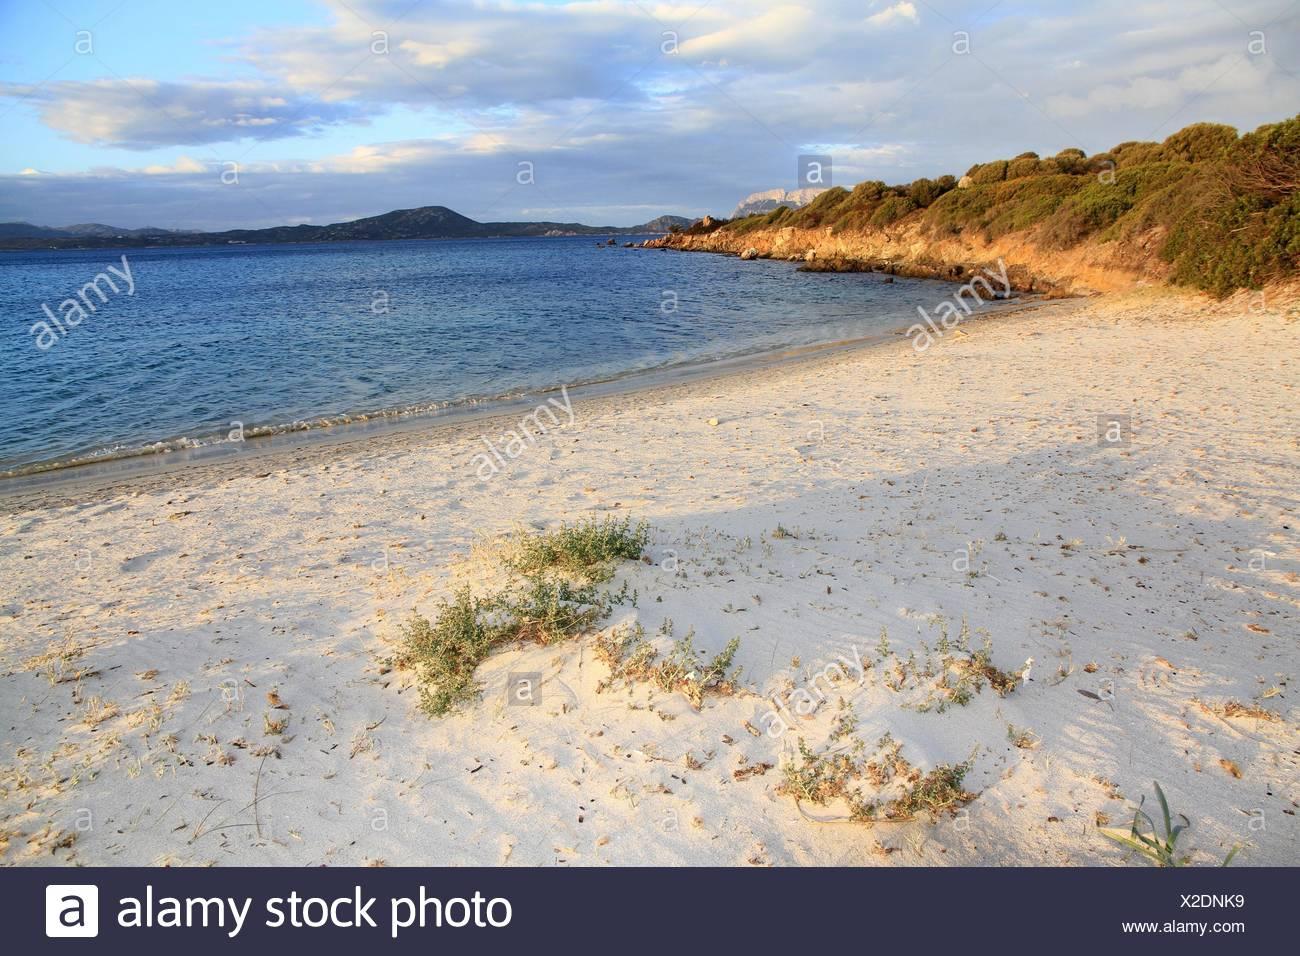 Pittugongo beach,Olbia province, Sardinia island, Italy - Stock Image